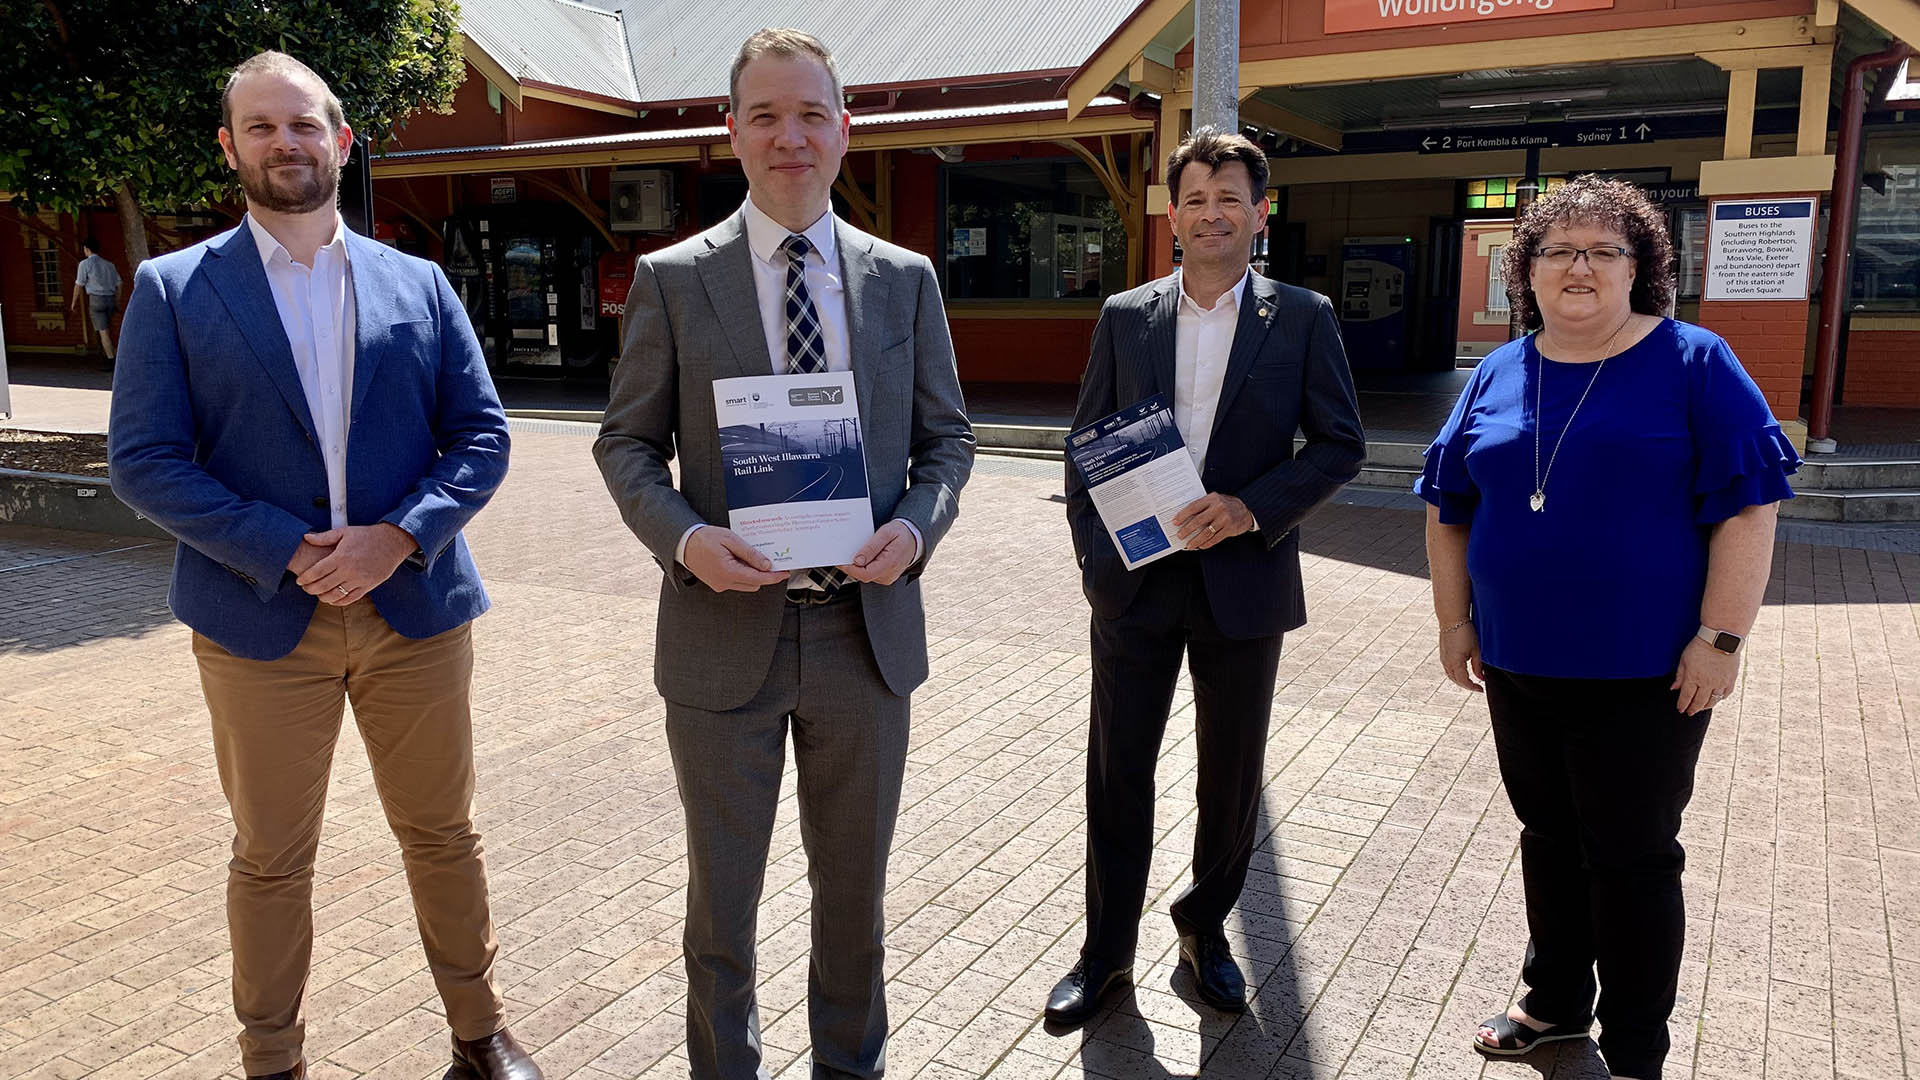 UOW backs South West Illawarra Rail Link proposal